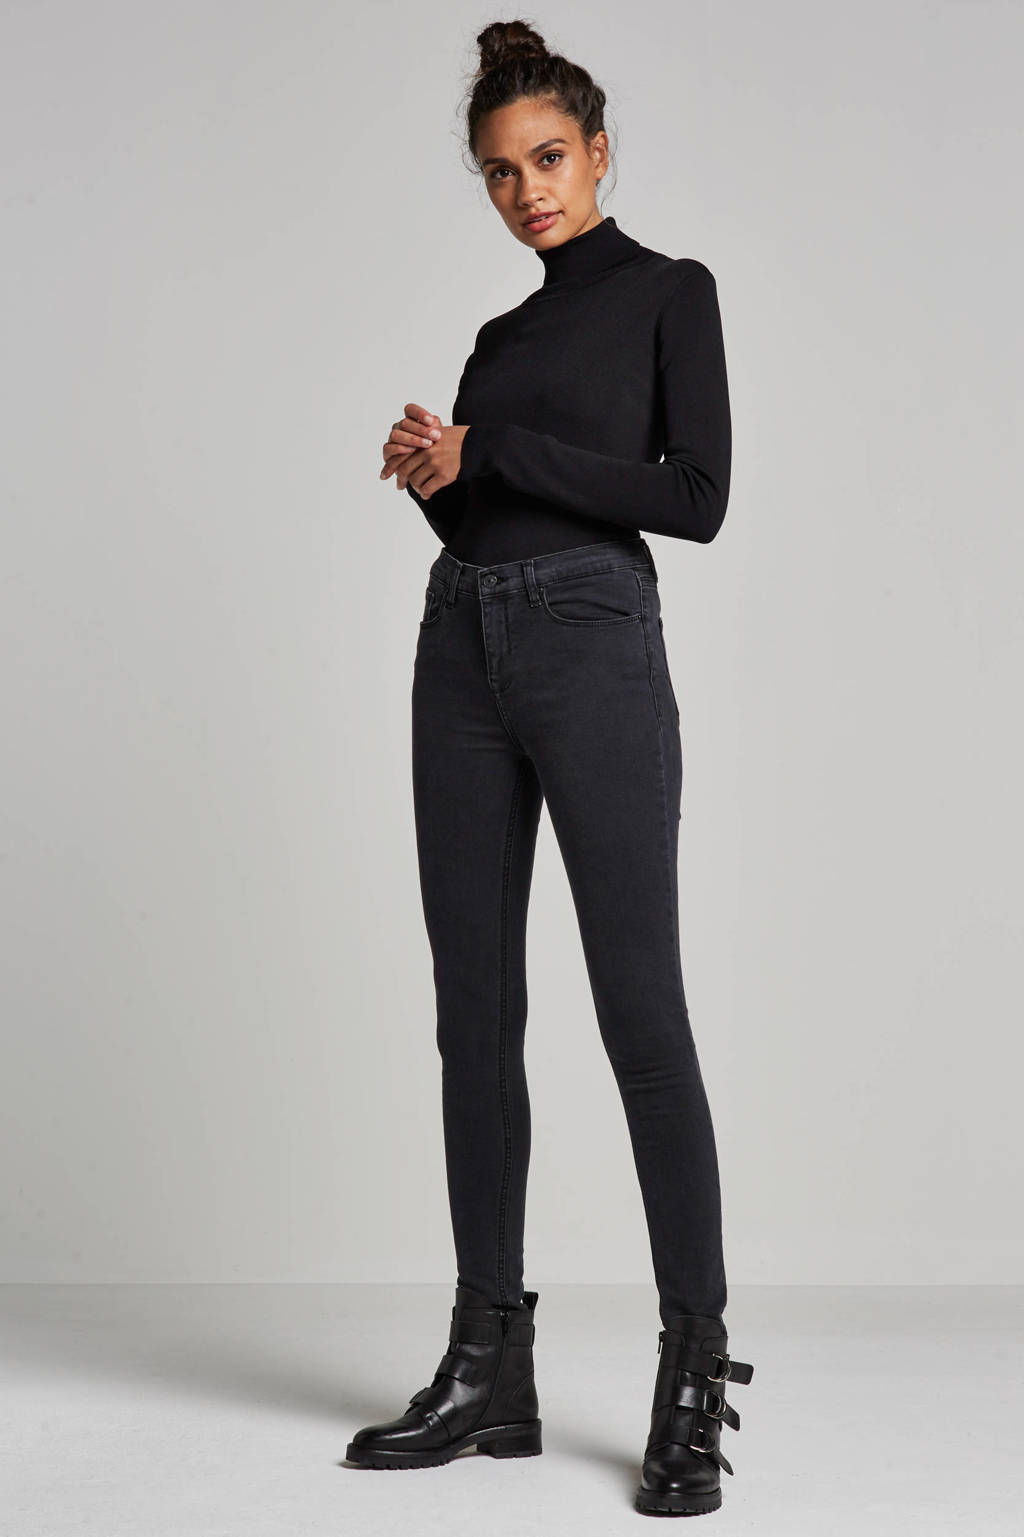 LTB Tanya high waist skinny fit jeans, LTB zwart